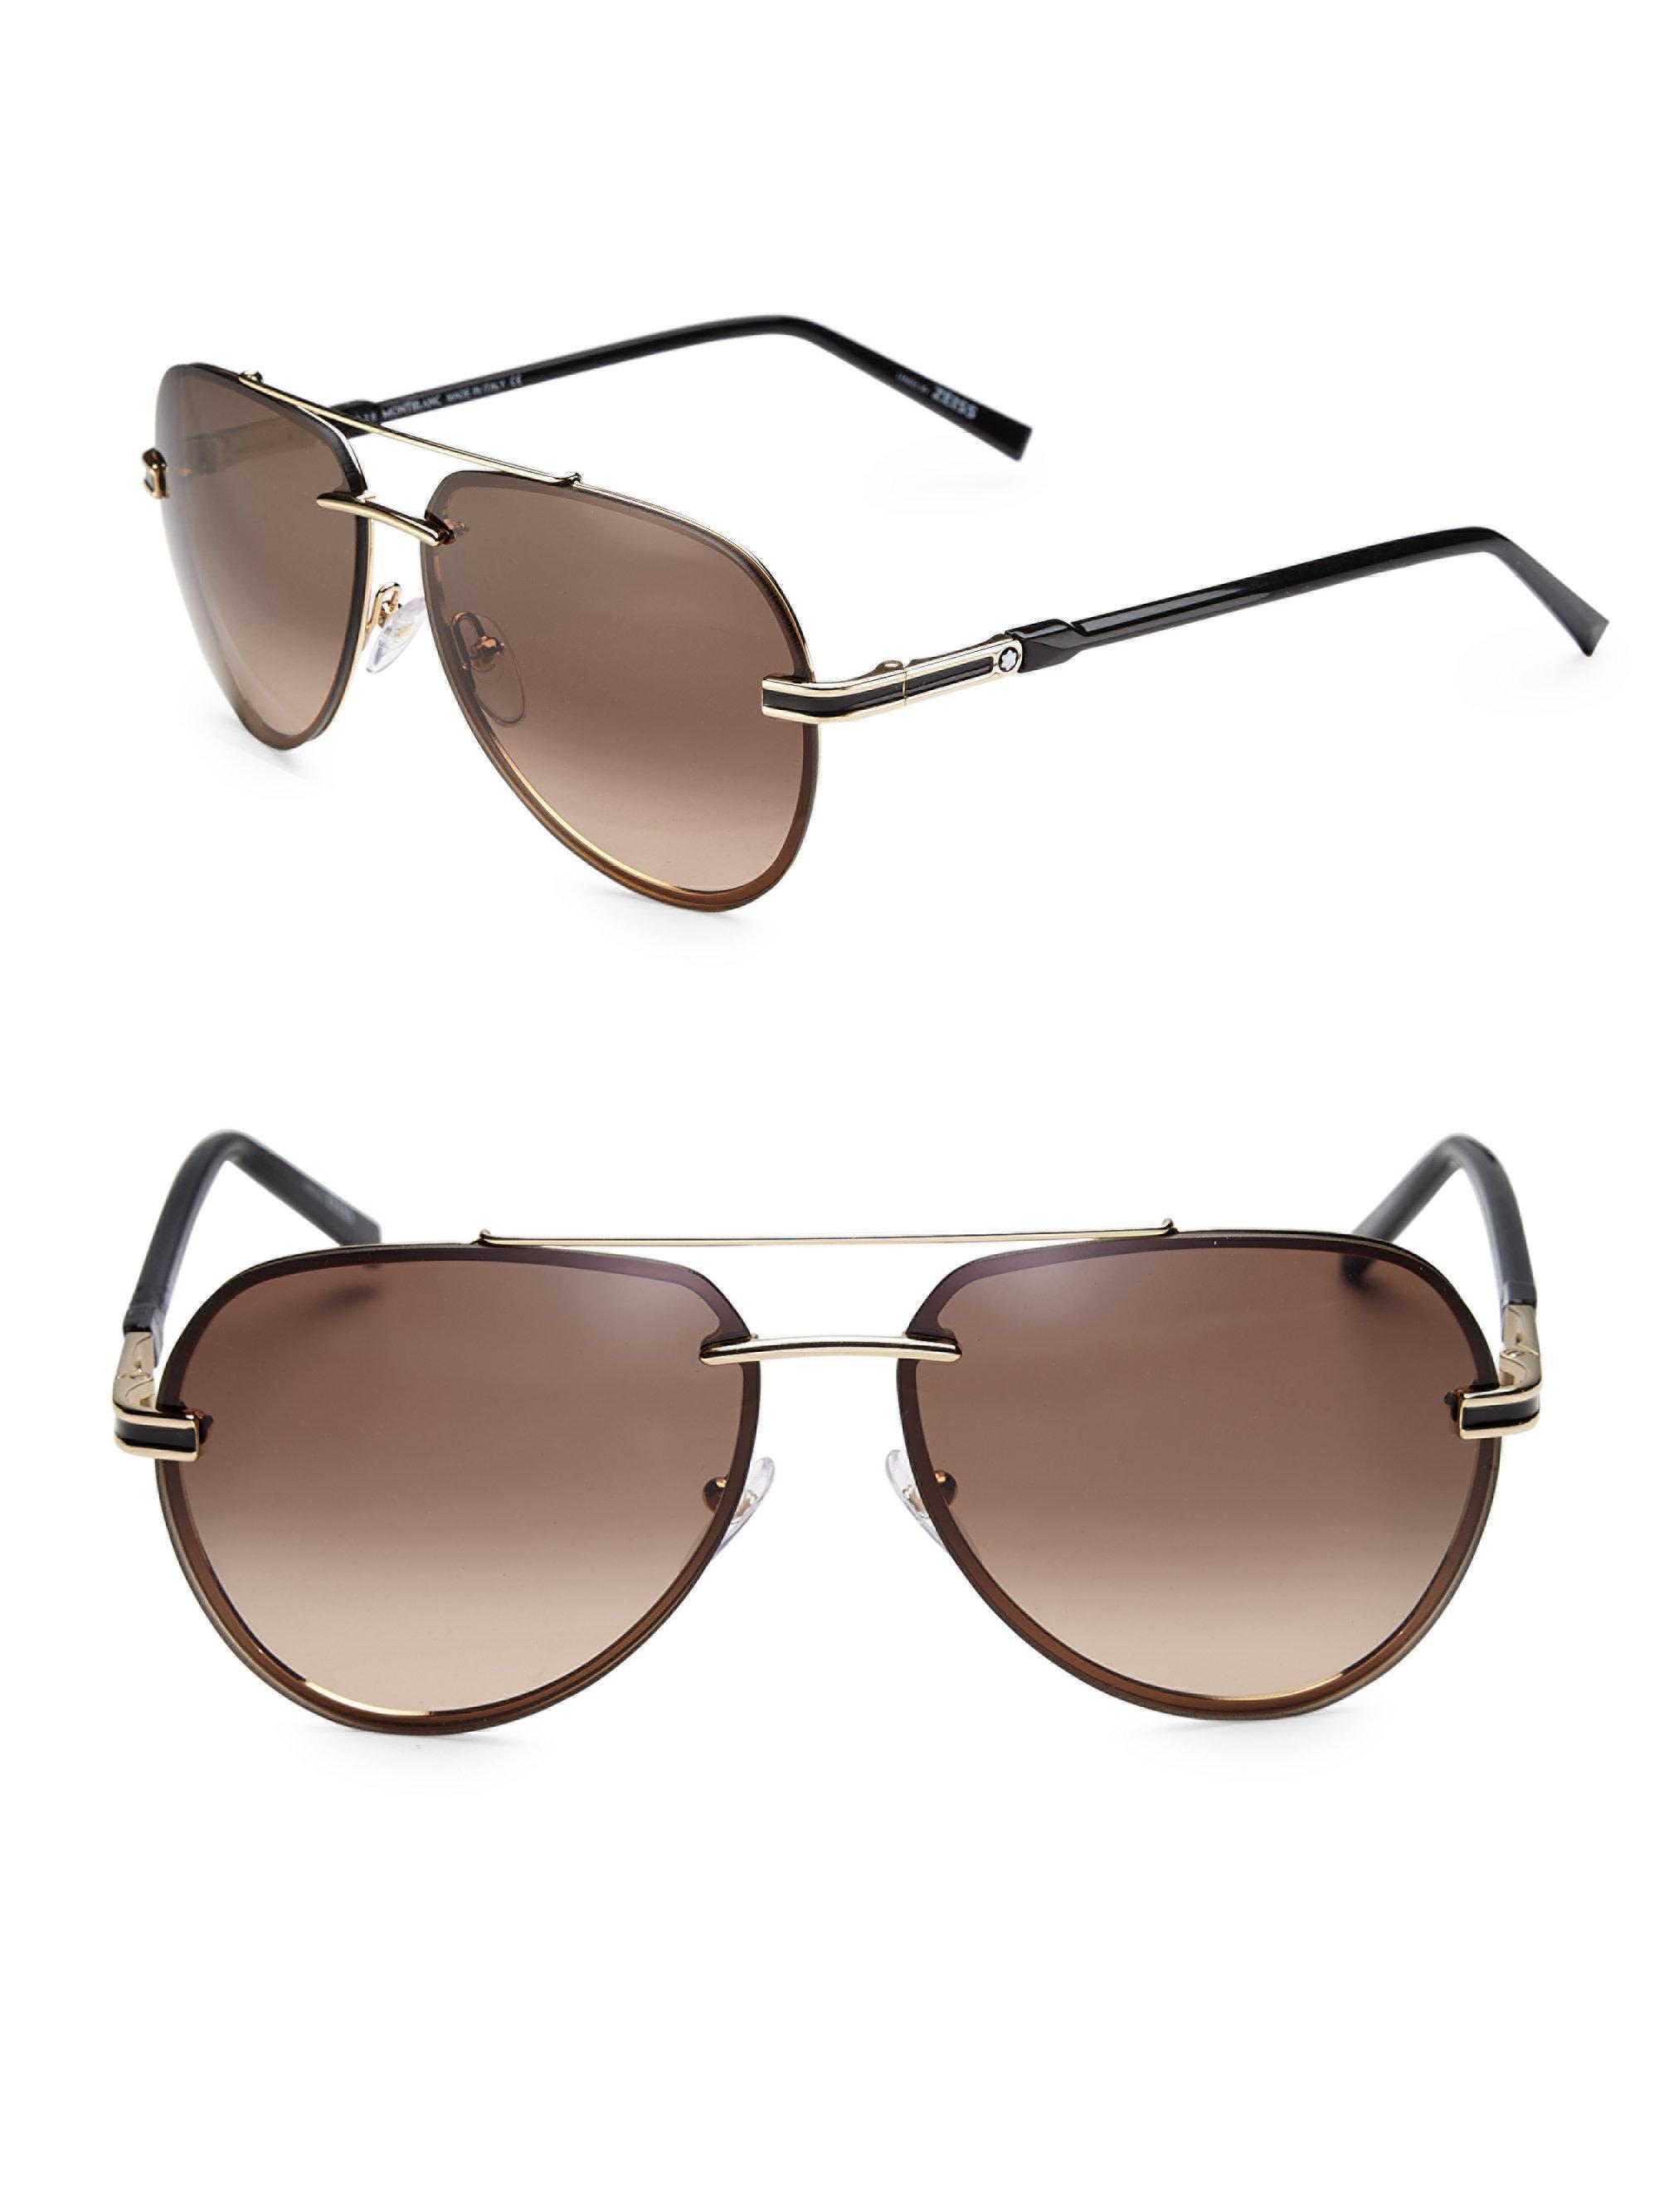 Rimless Aviator Sunglasses : Montblanc 60mm Rimless Aviator Sunglasses in Metallic Lyst